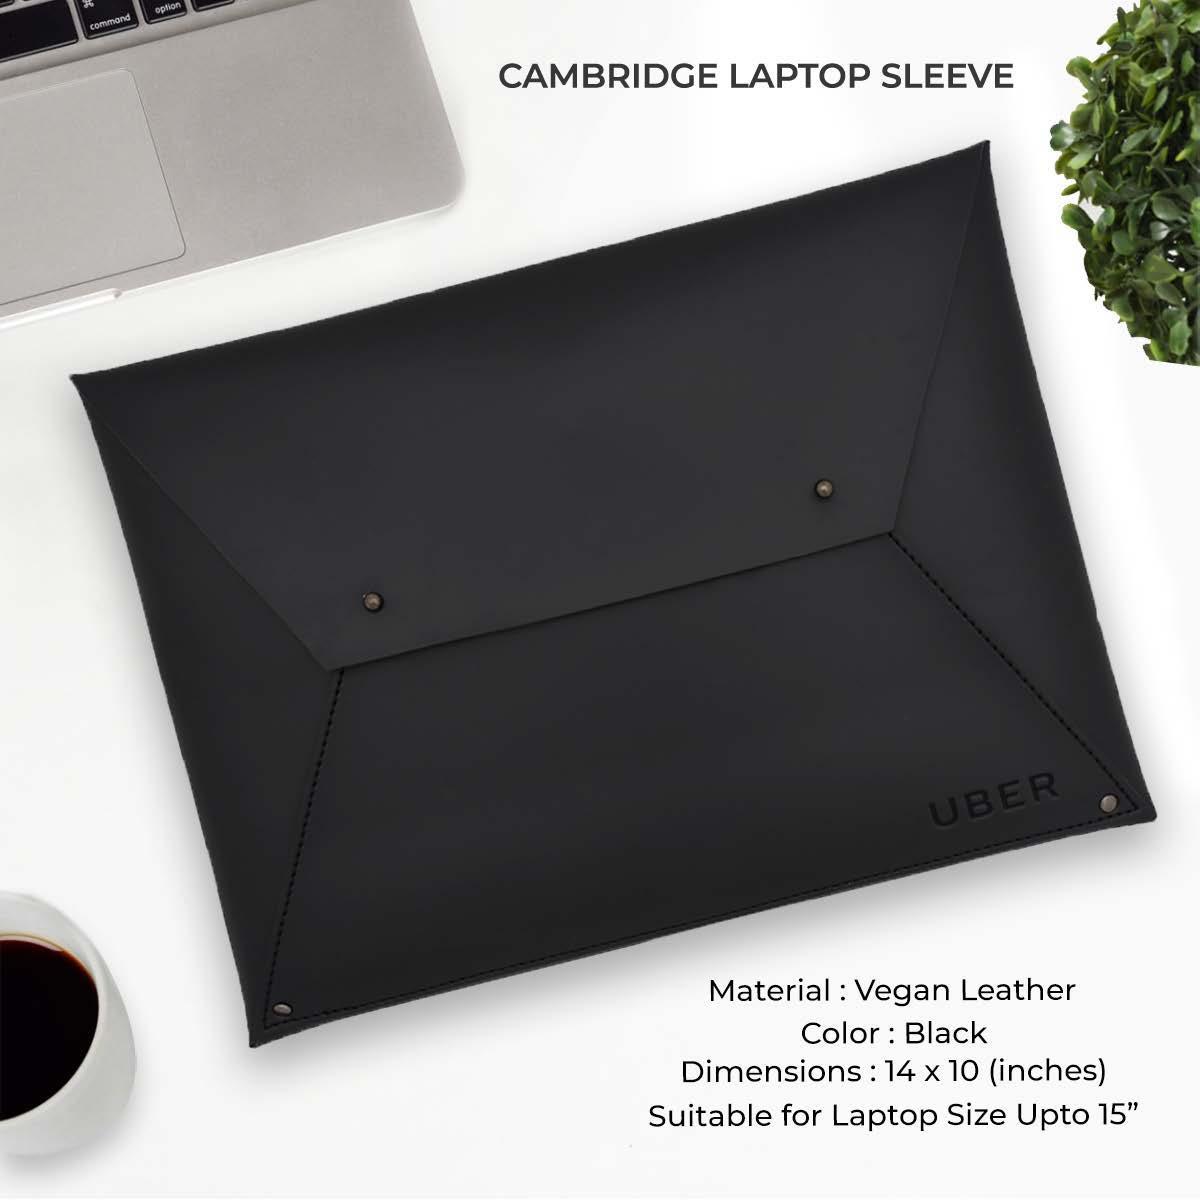 Cambridge Laptop Sleeve - Black